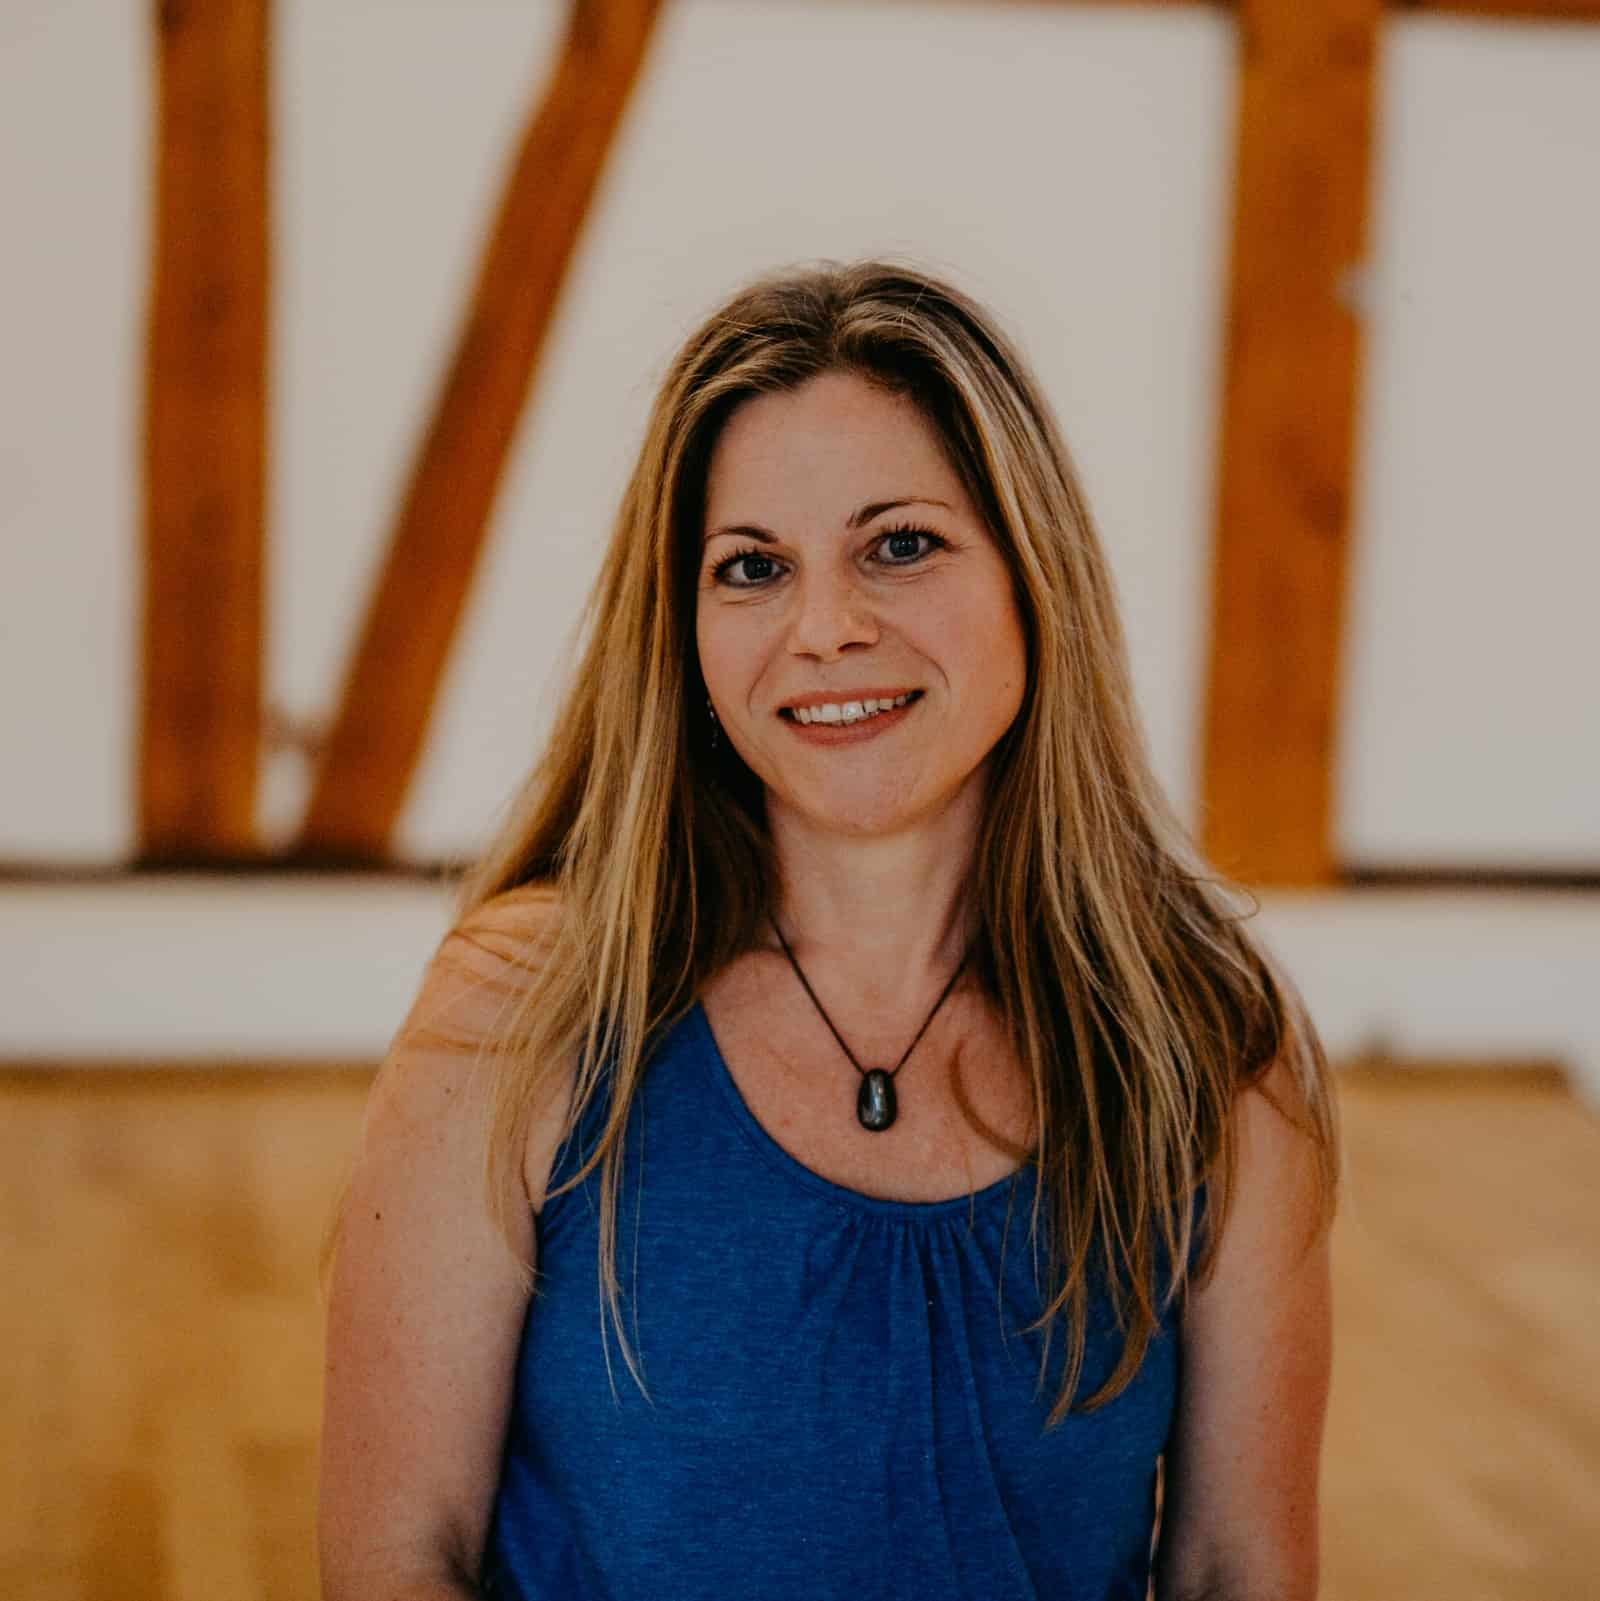 Sandra Teschke - Yogalehrerin (BYV), Ayur-Yoga, Yin-Yoga, Vinyasa Flow